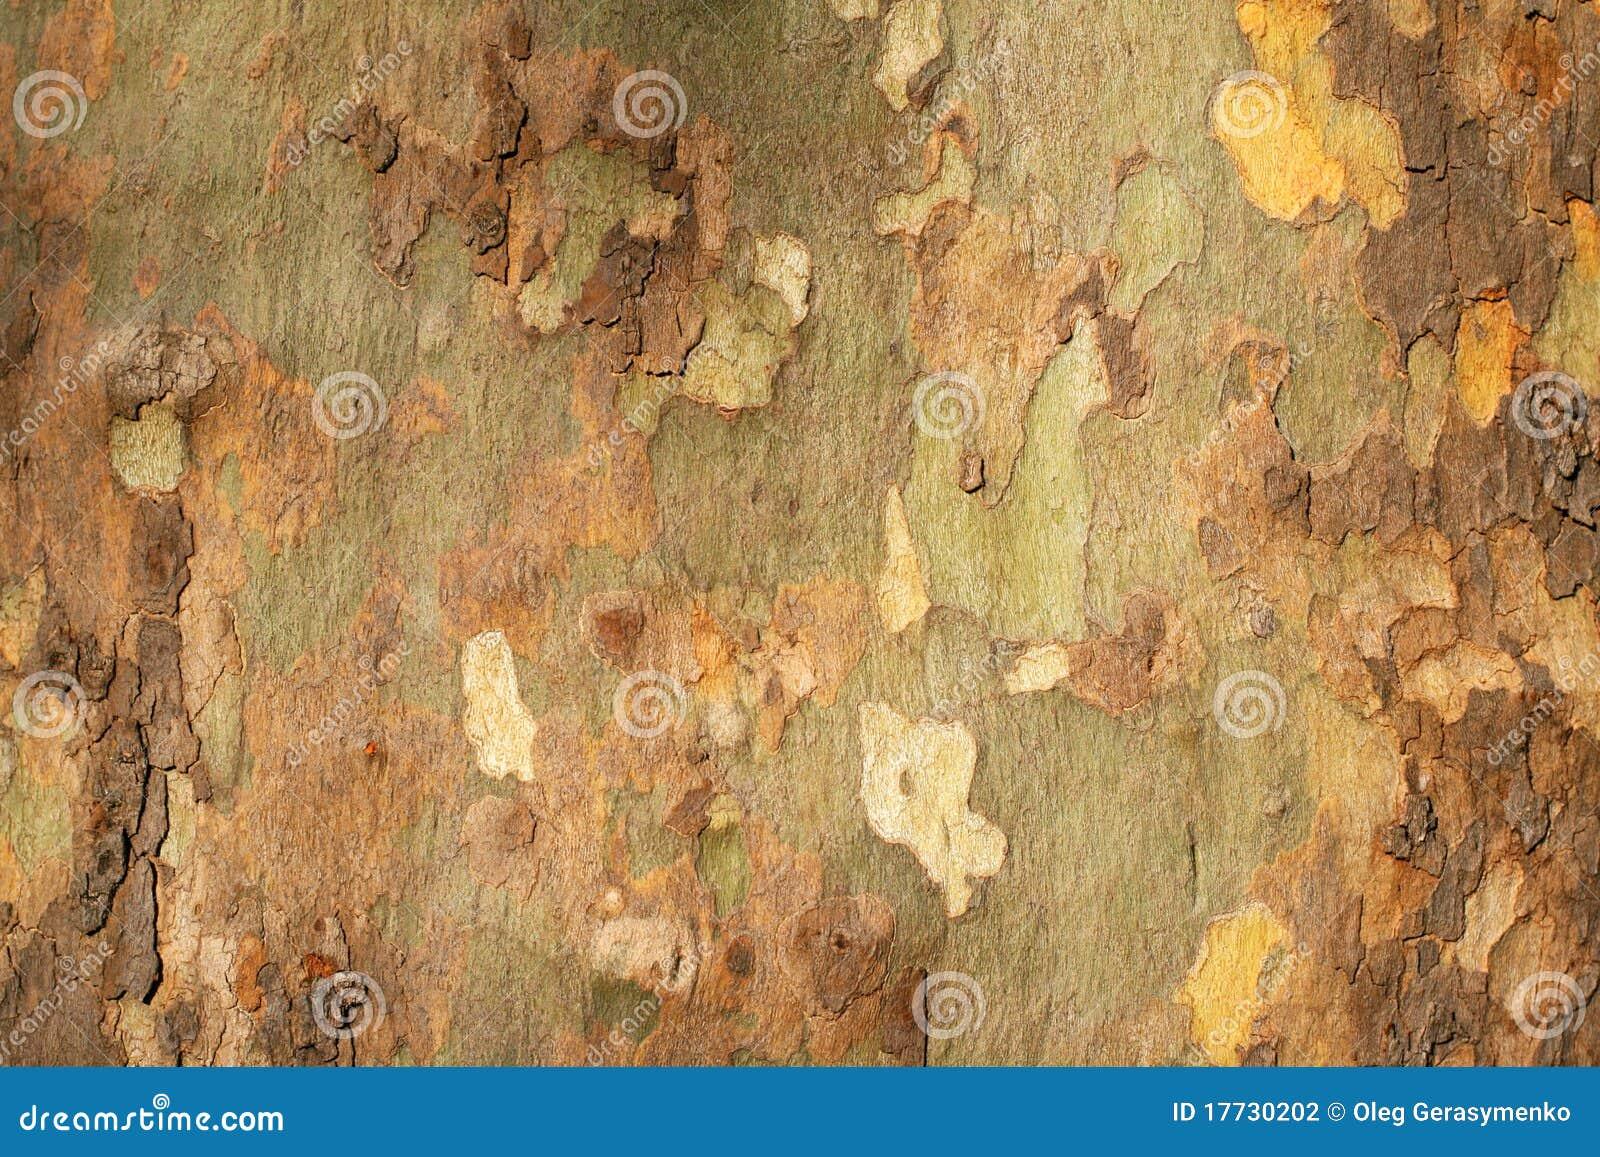 Platan tree bark texture